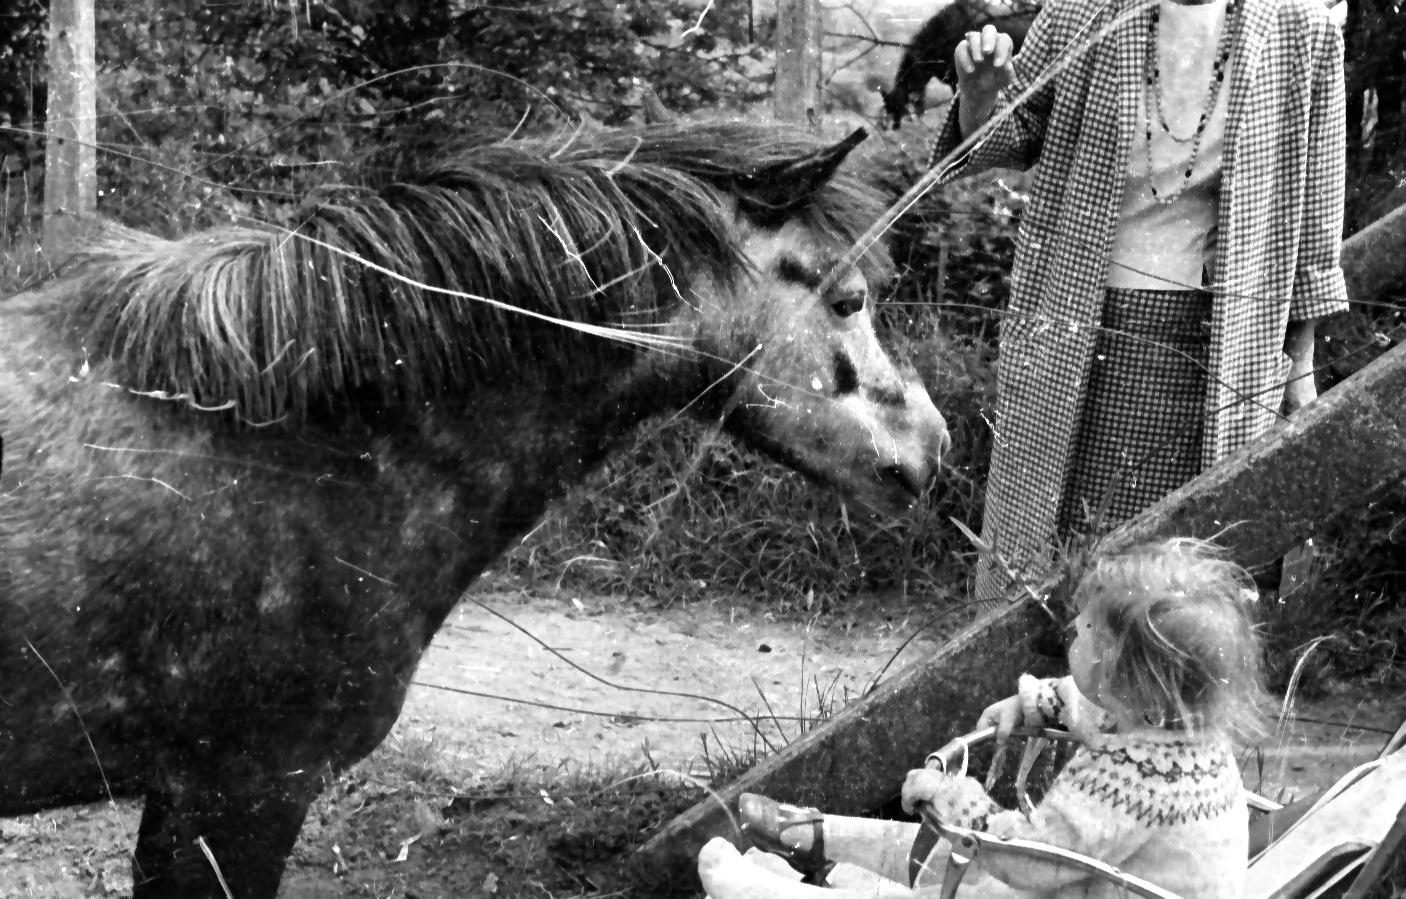 jenny and horse